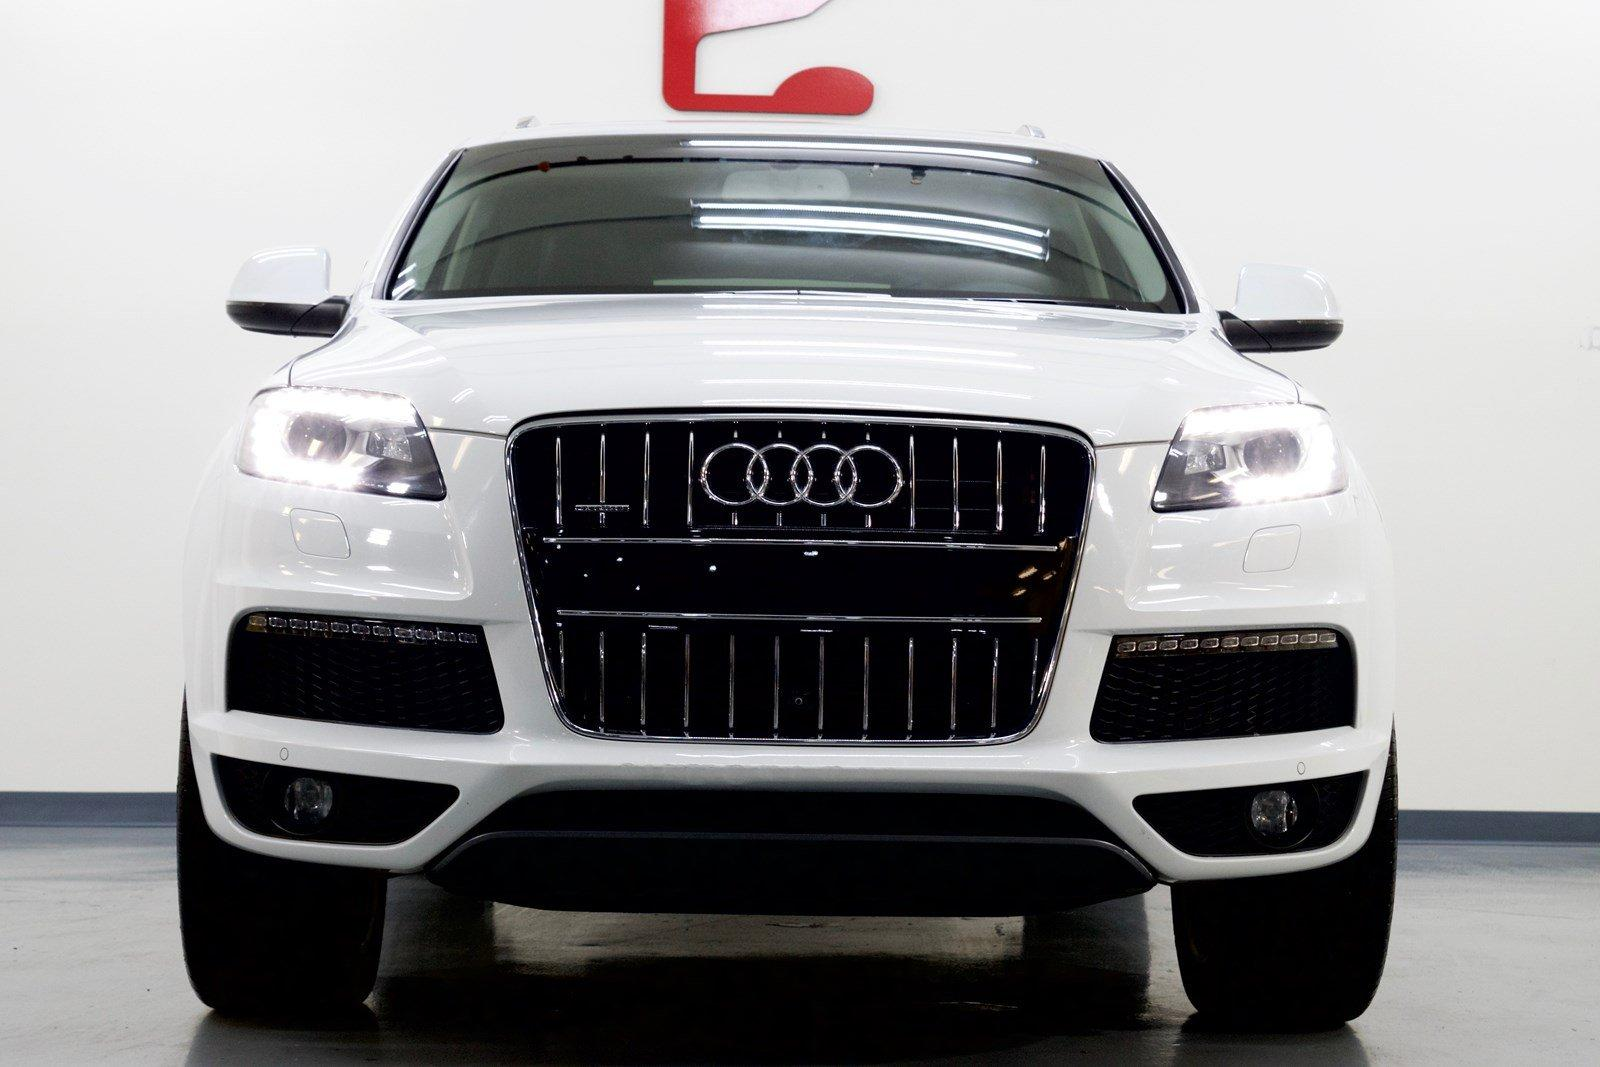 2014 Audi Q7 3.0 Ts Line Prestige >> 2014 Audi Q7 3 0t S Line Prestige Stock 012915 For Sale